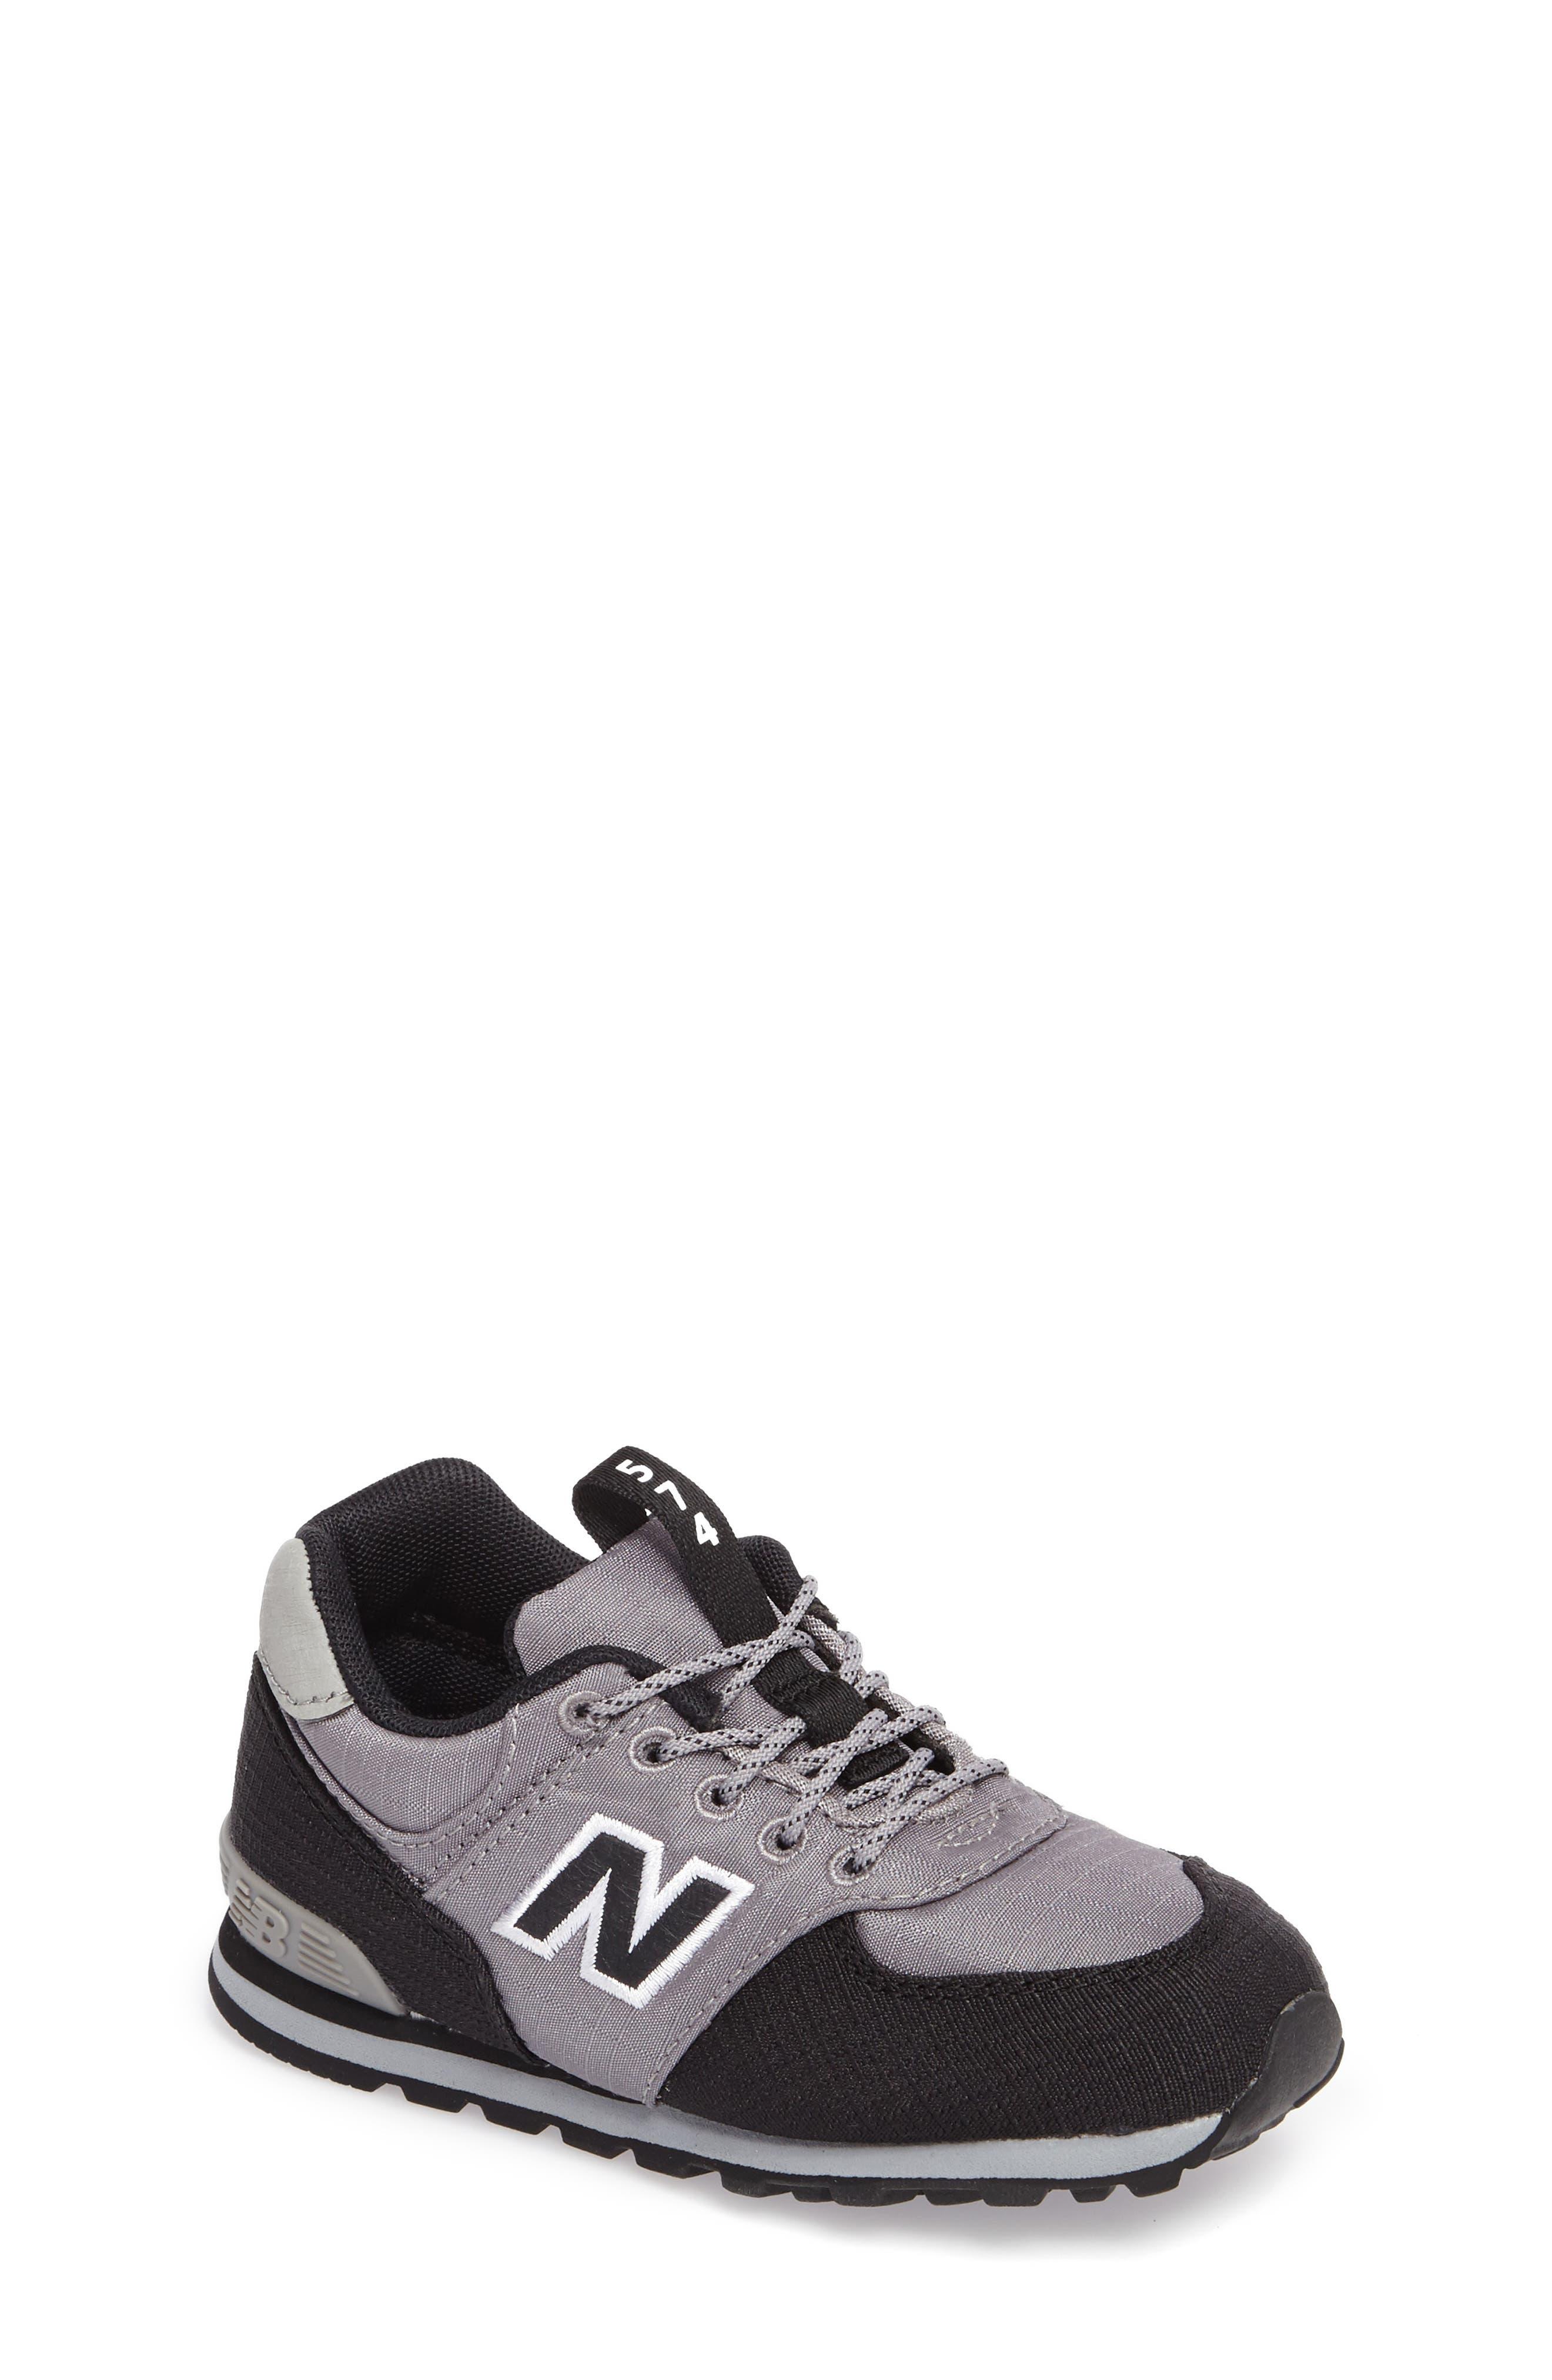 574 Sneaker,                         Main,                         color, Grey